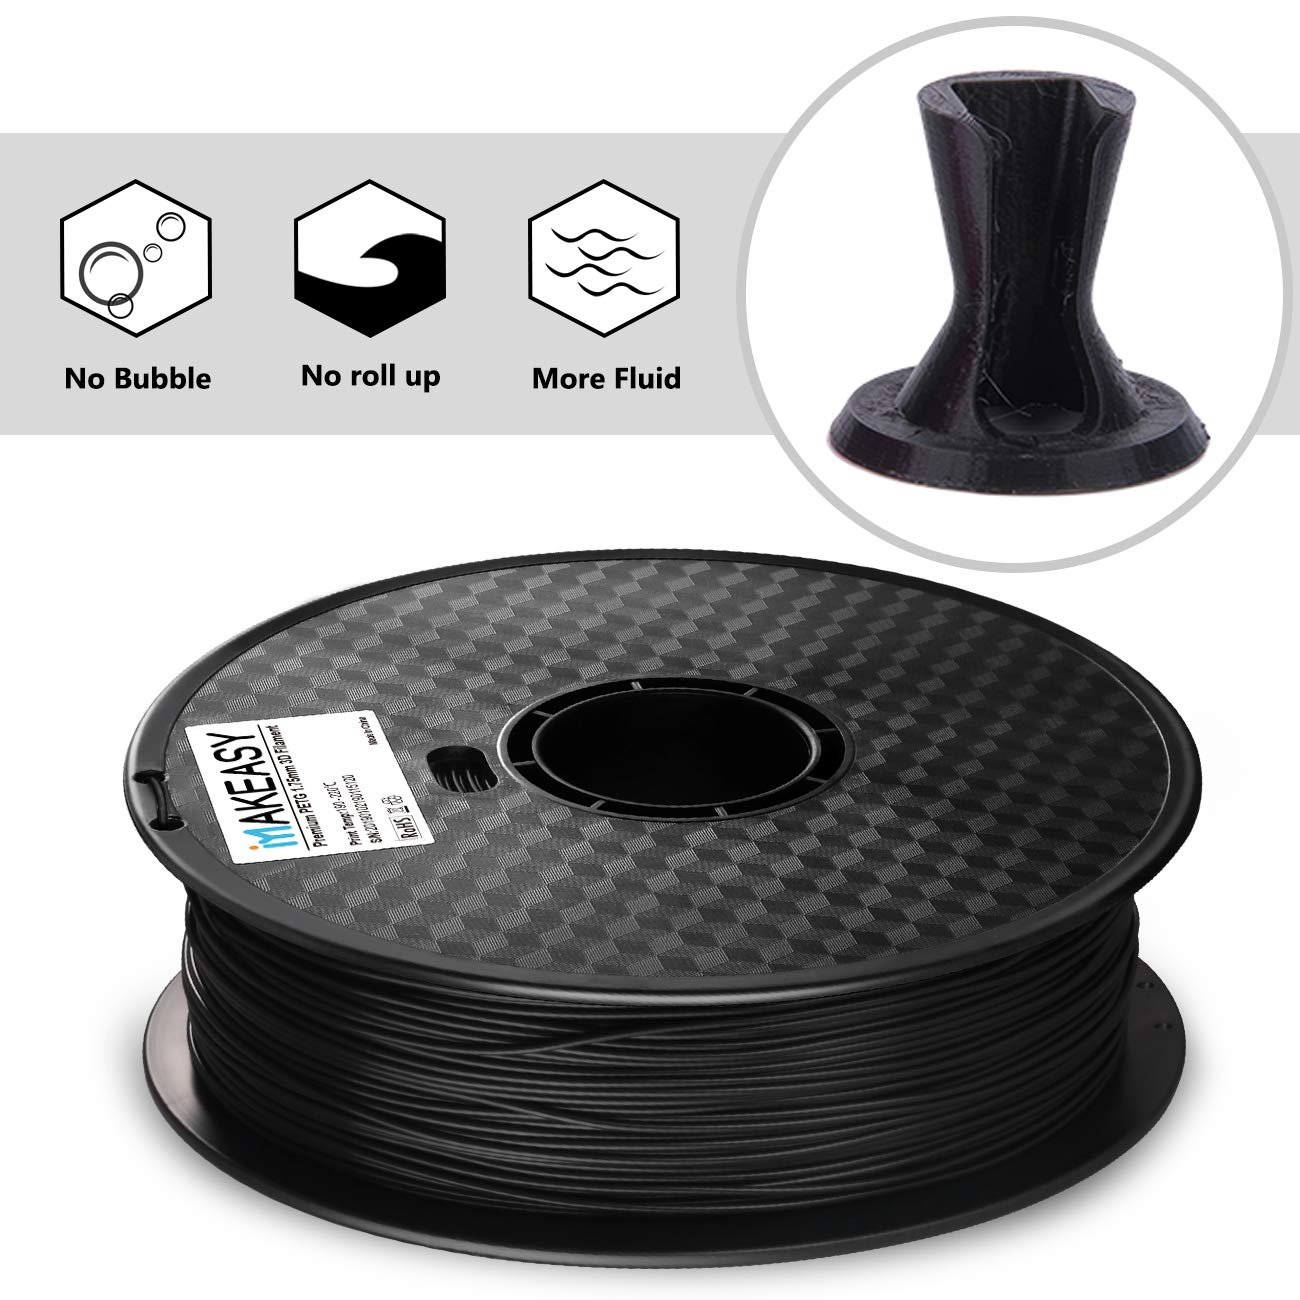 MAKEASY Dimensional Accuracy +//- 0.05 mm Black 3D Printer Filament 1kg Spool PETG Filament 1.75mm